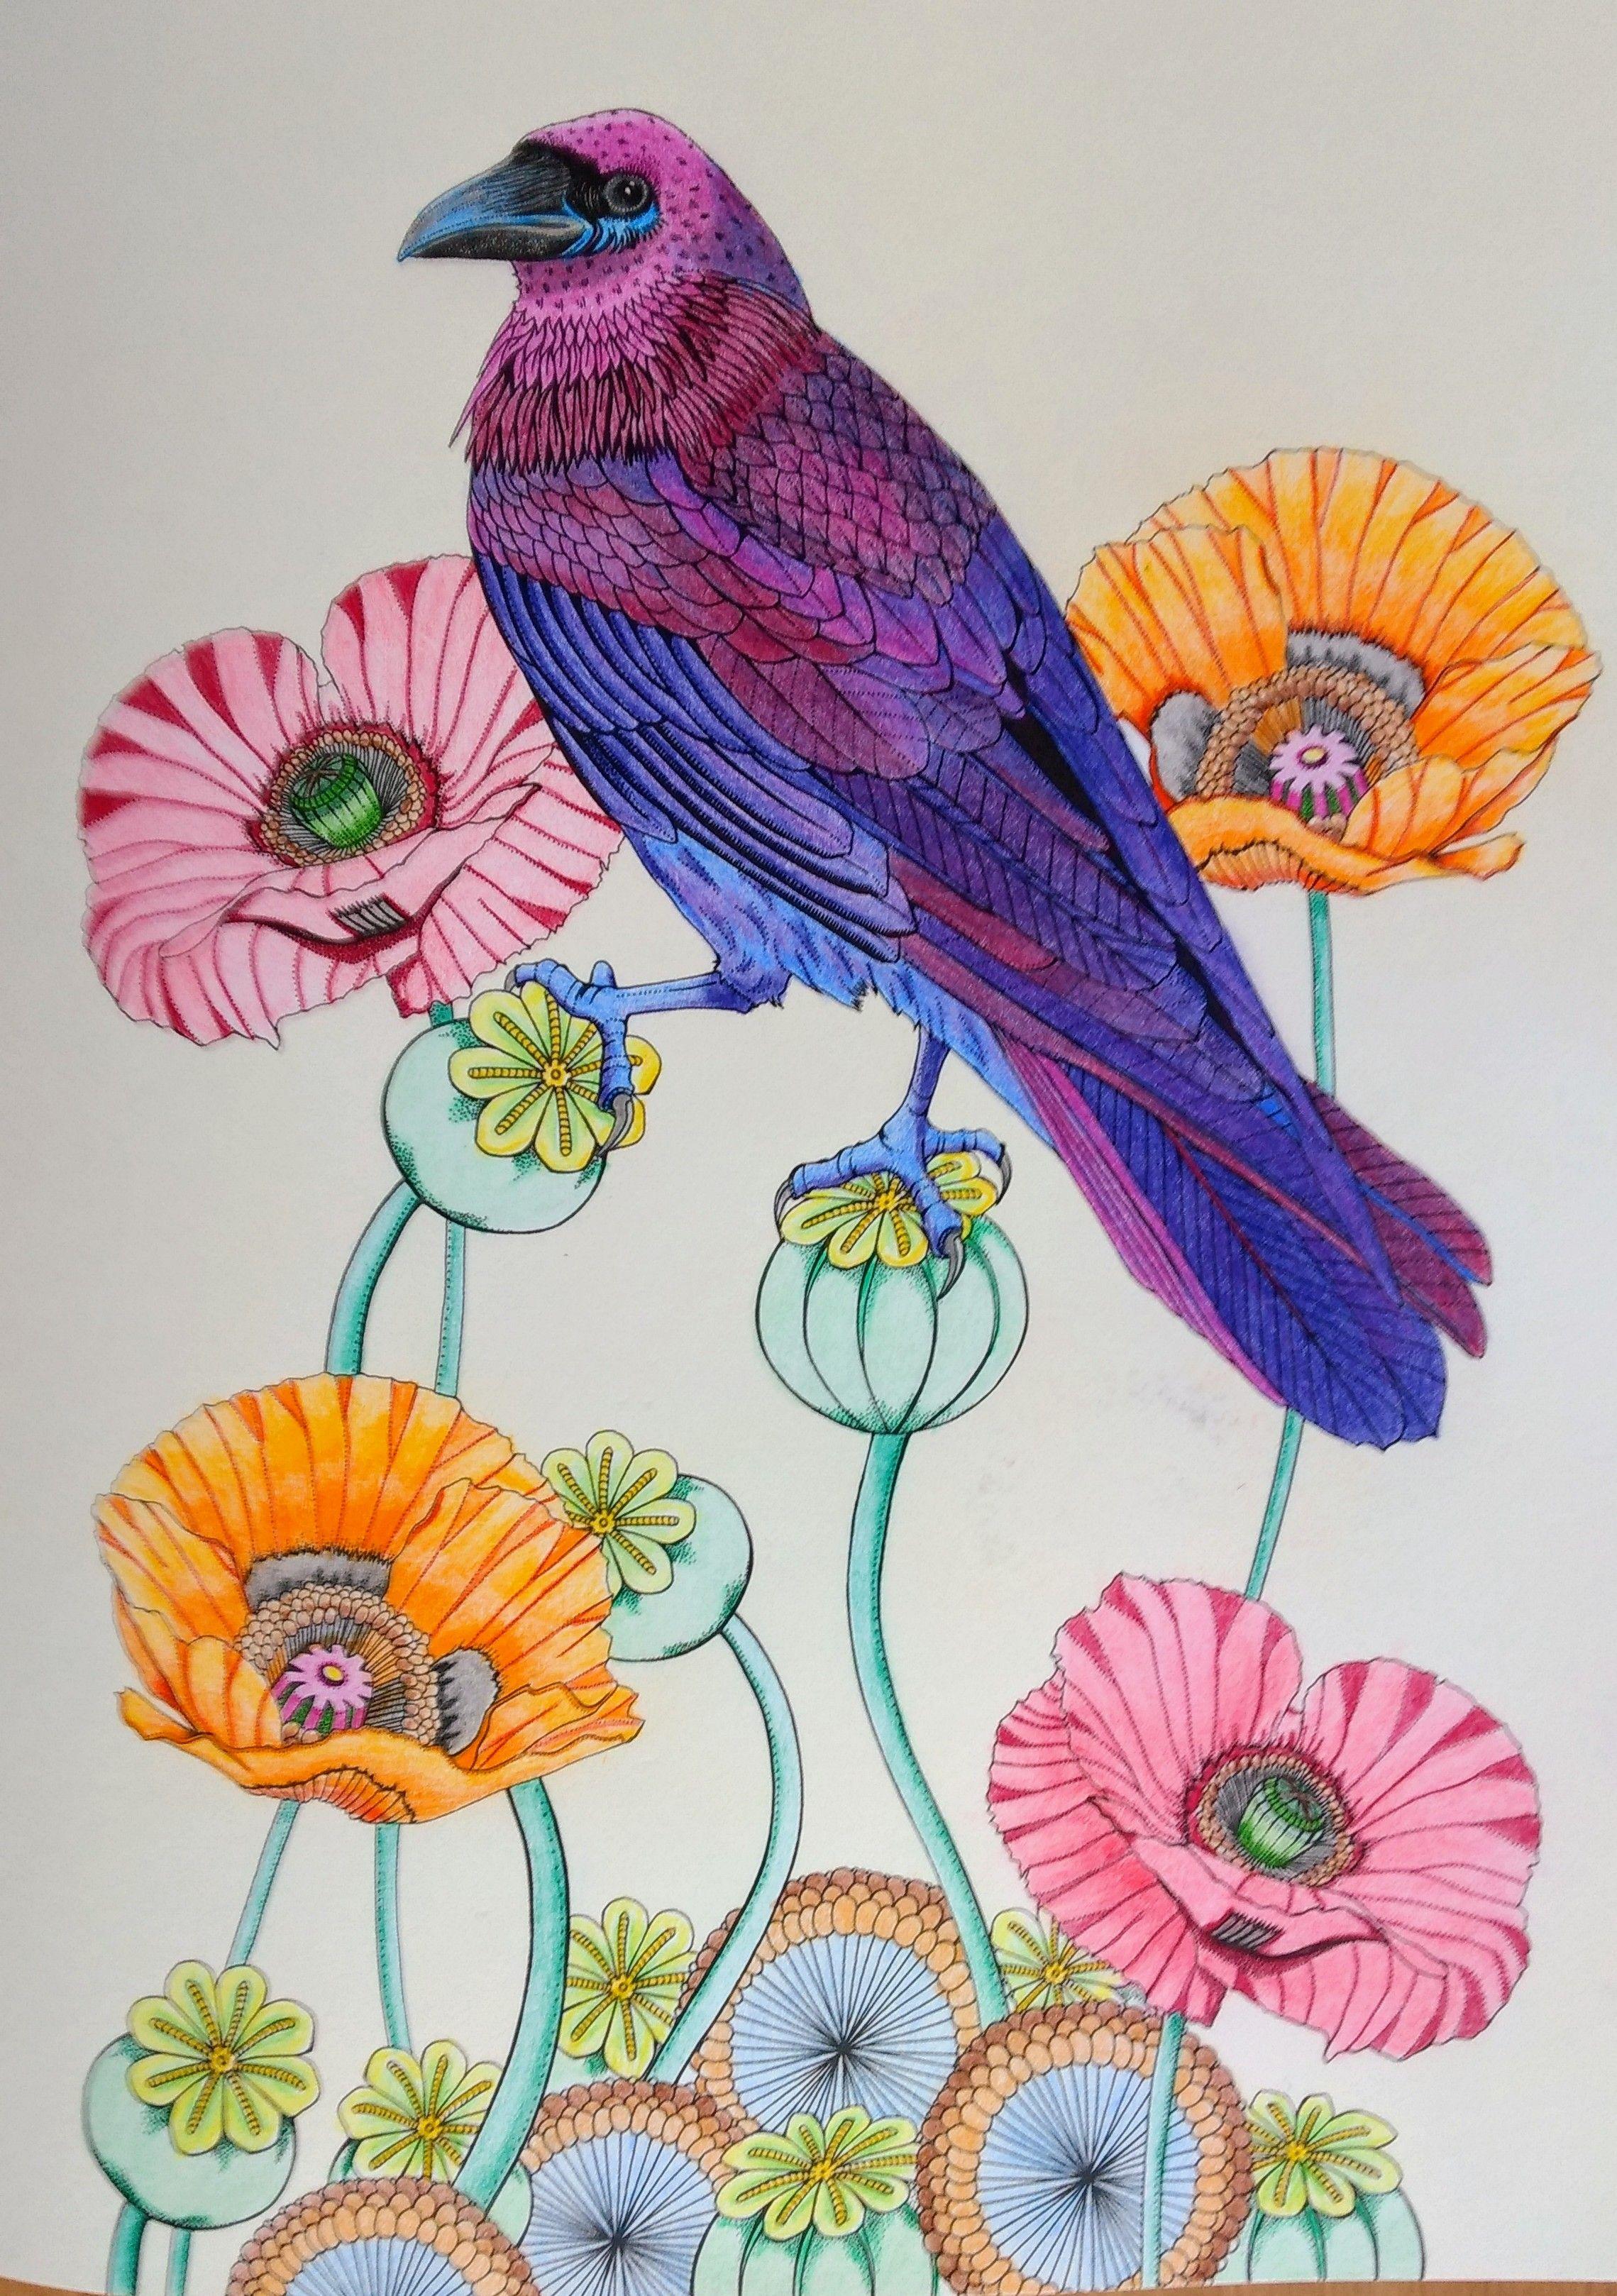 Coloring Book Birdtopia Daisy Fletcher Coloring Books Coloring Pages Colored Pencils